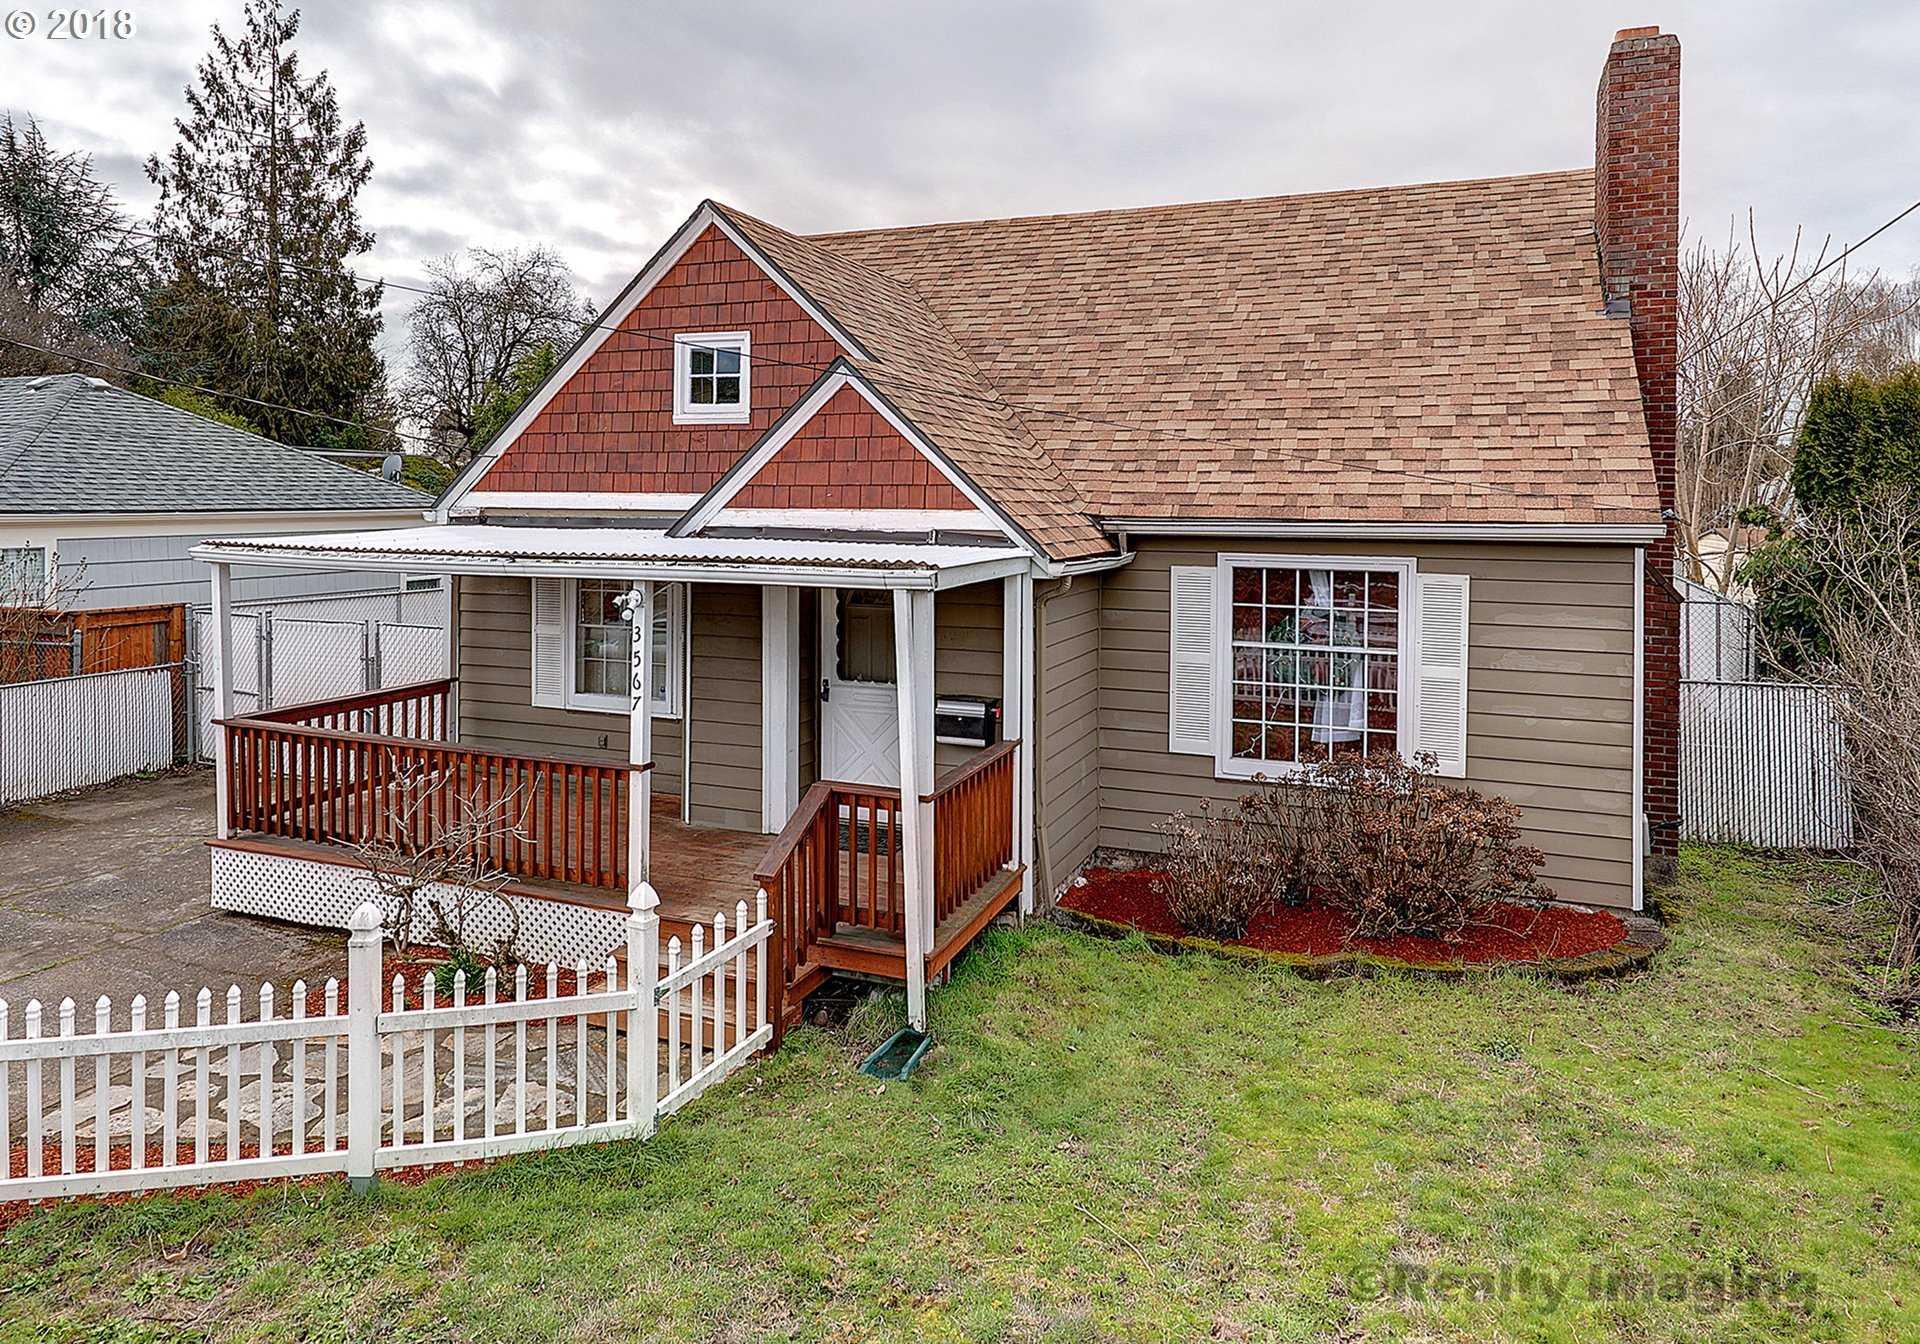 $479,000 - 3Br/2Ba -  for Sale in Foster - Powell, Portland